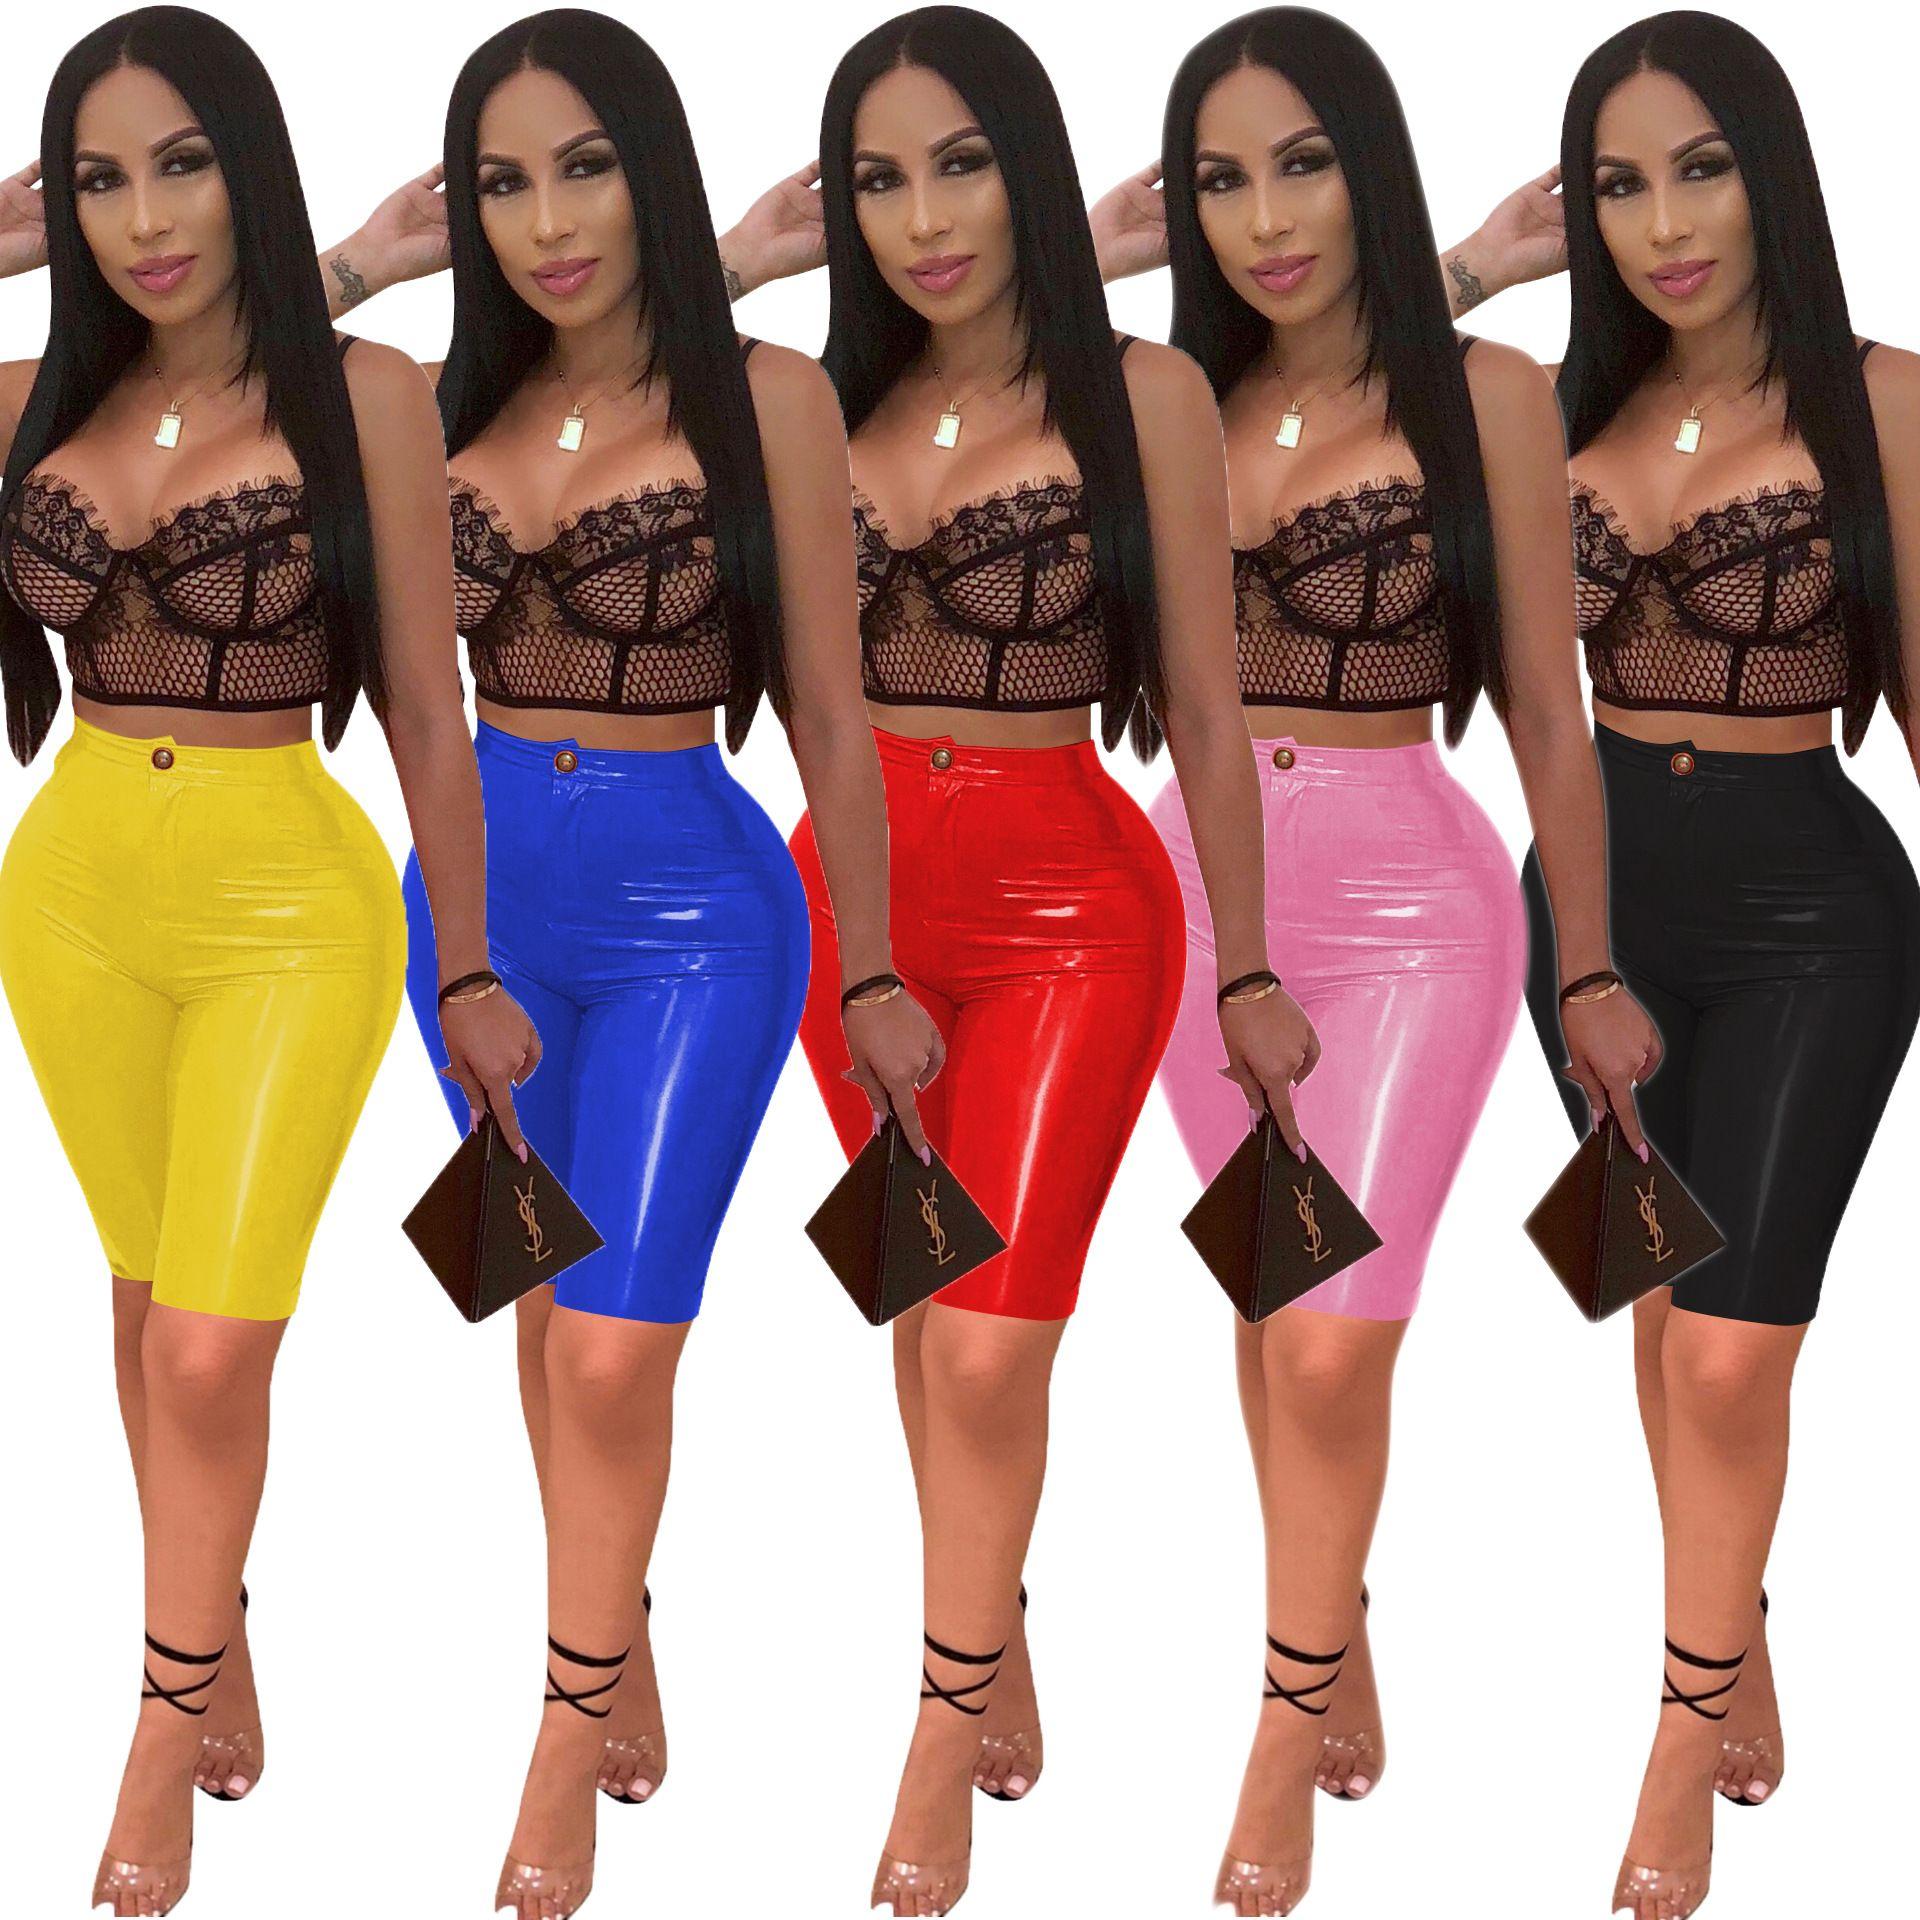 Women Sexy Charming Bright PU Pants Faux Leather Skinny Shorts lady Fashion Button Zipper Slim Knee Length 1/2 Capris Short Trousers